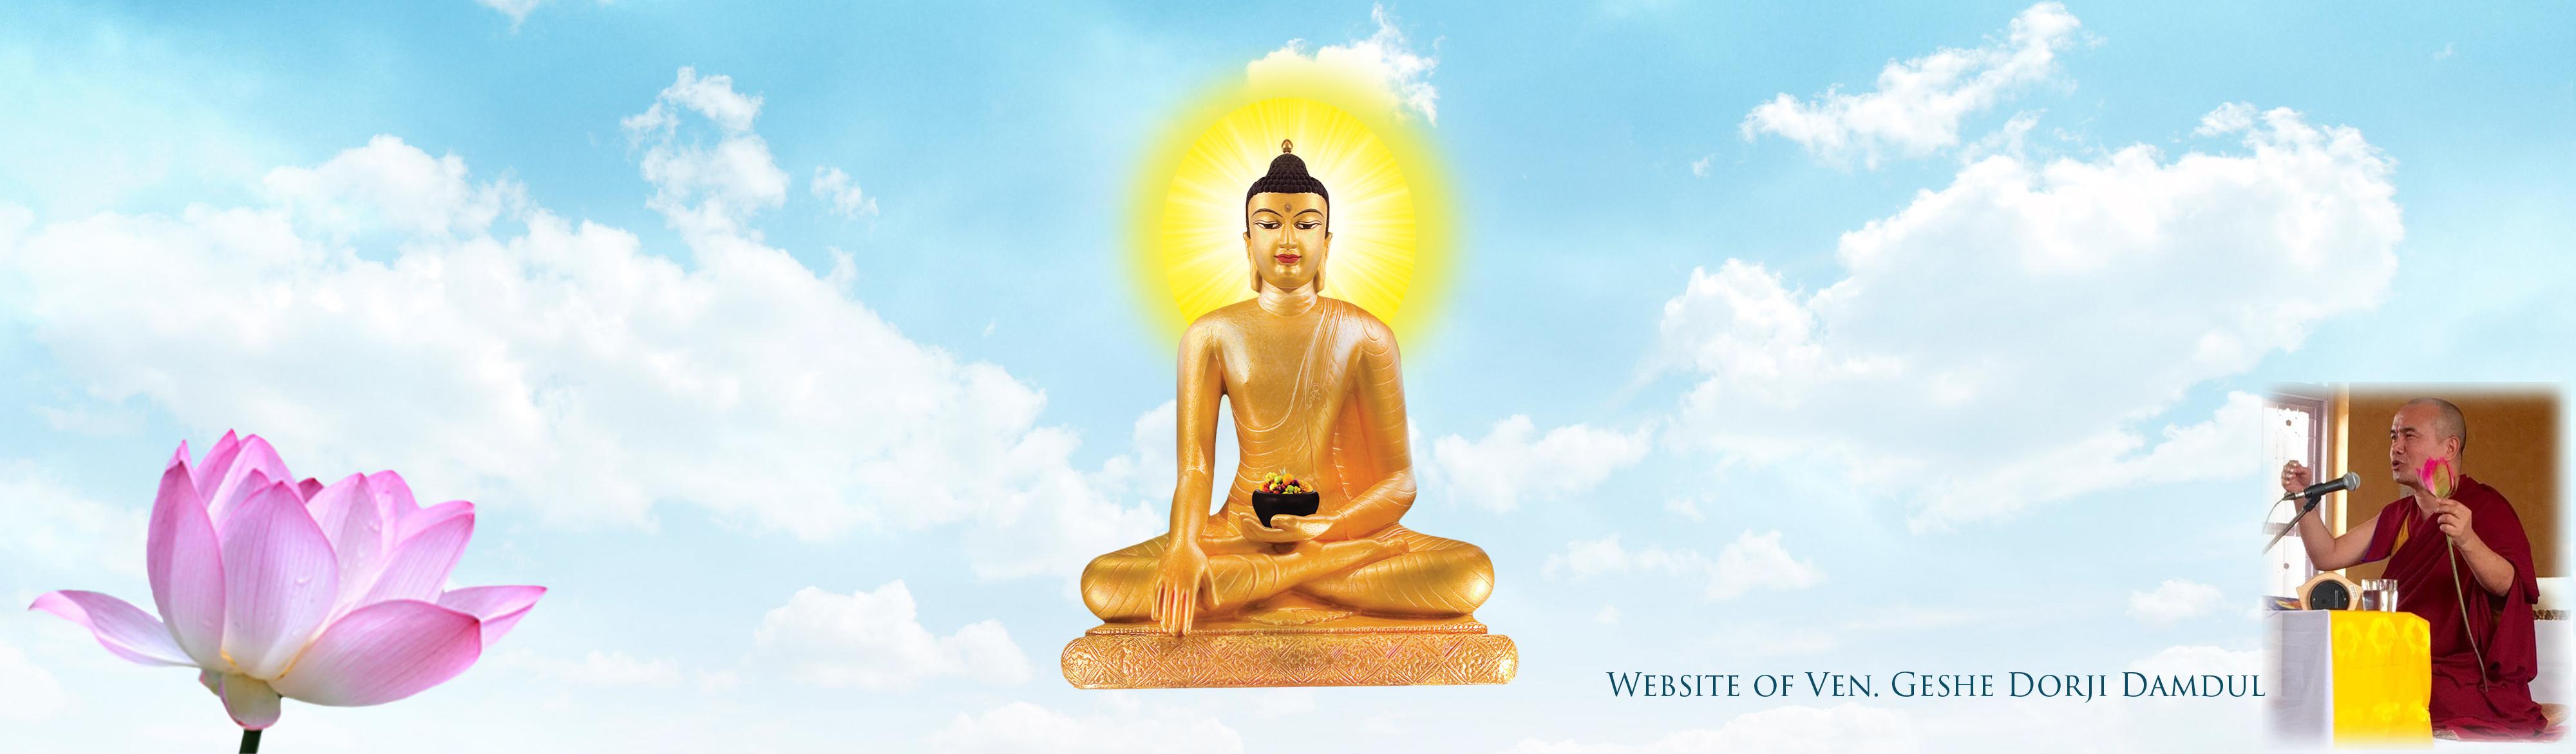 Bodhiwisdom